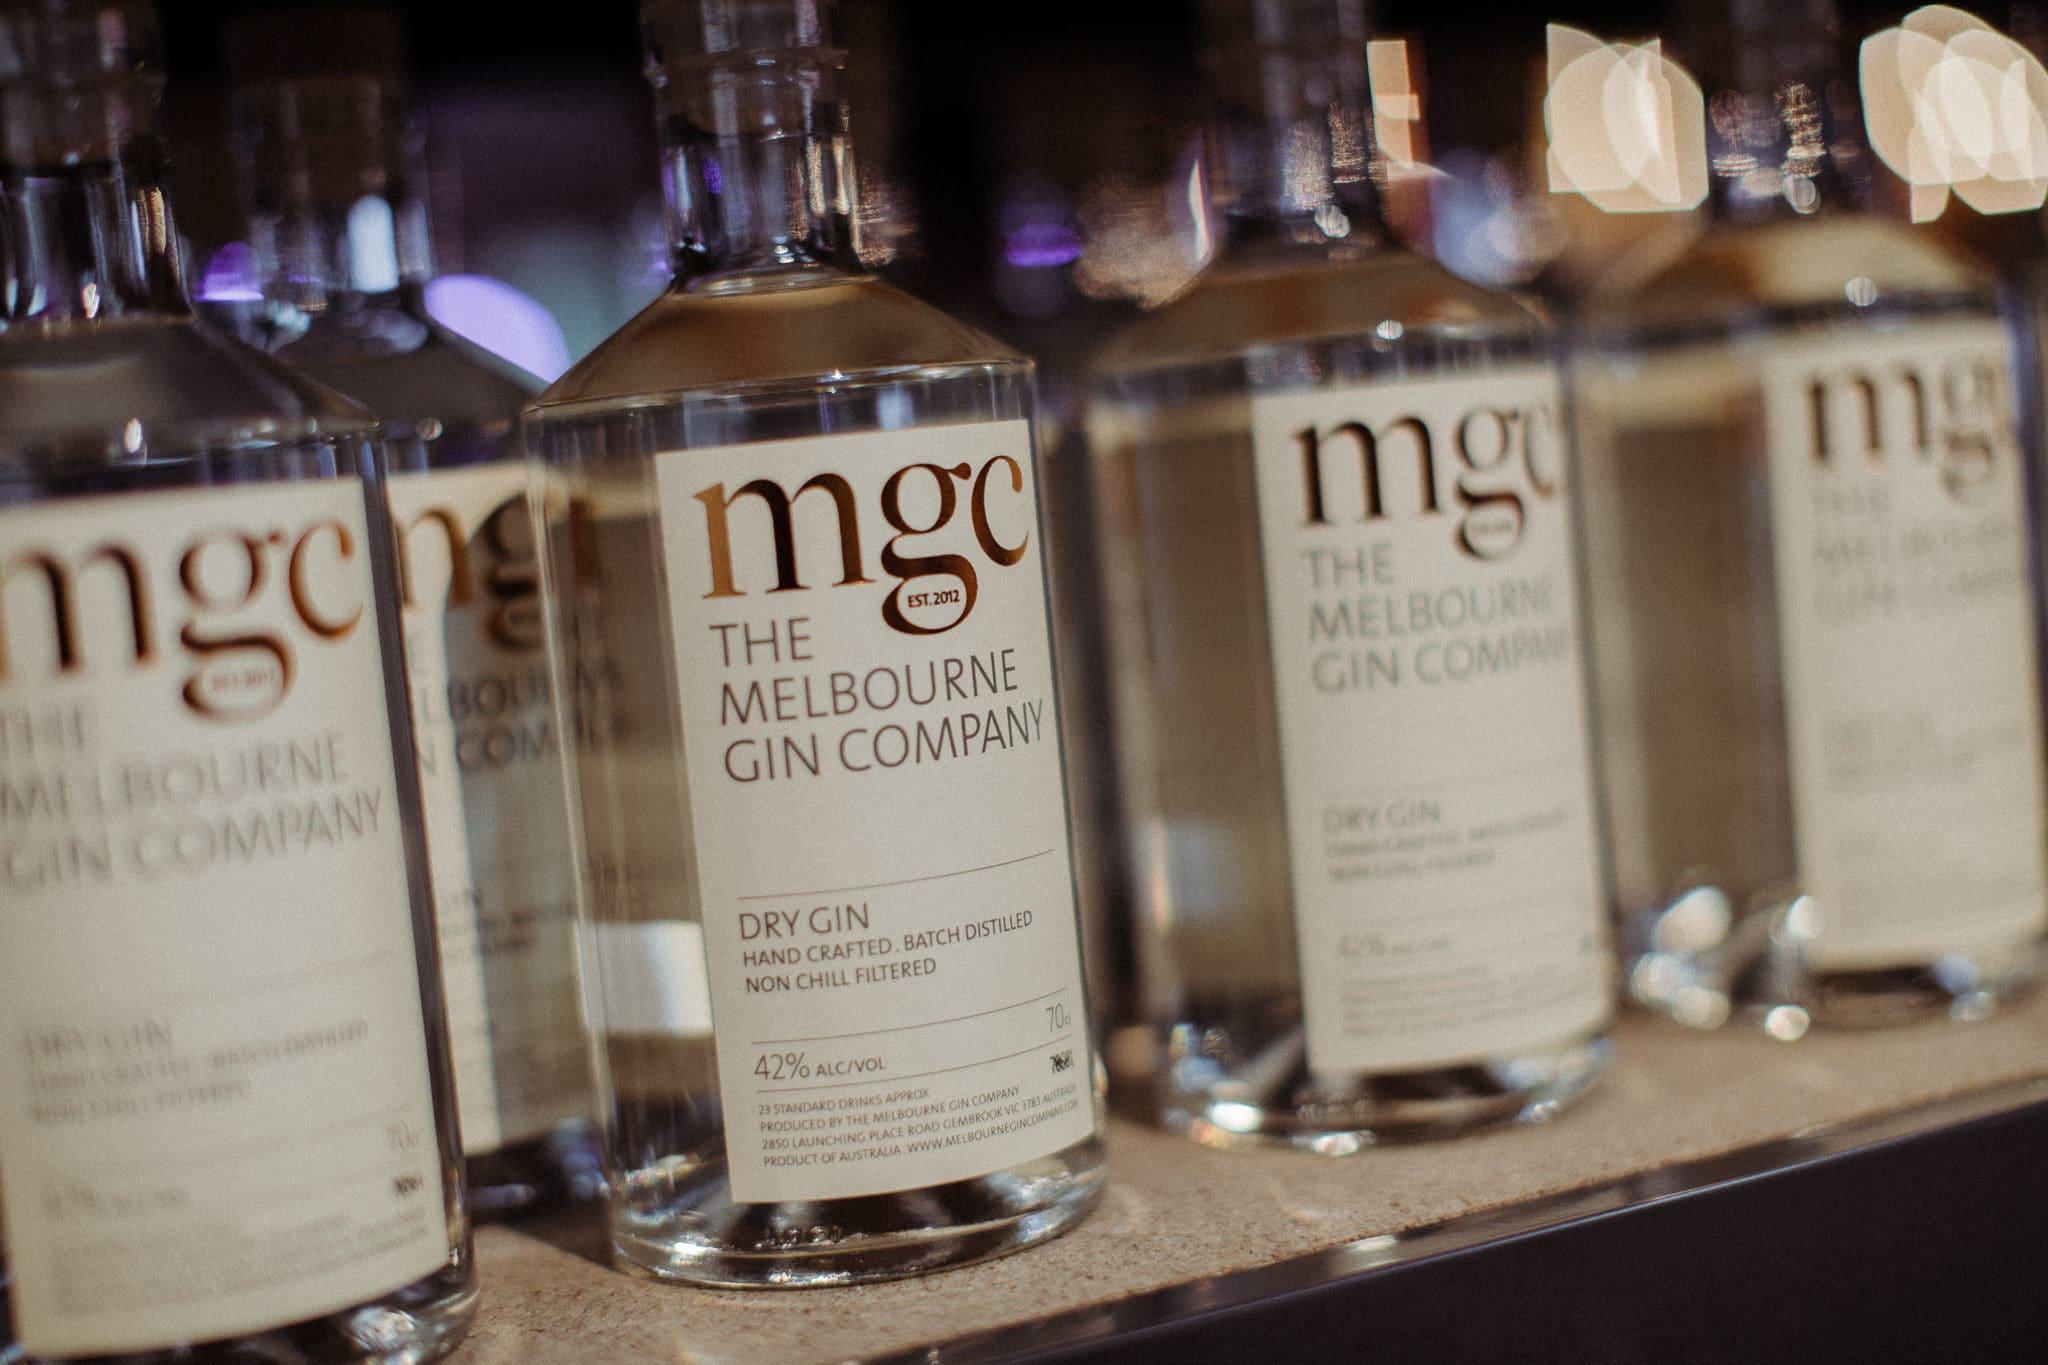 mgc - melbourne gin company